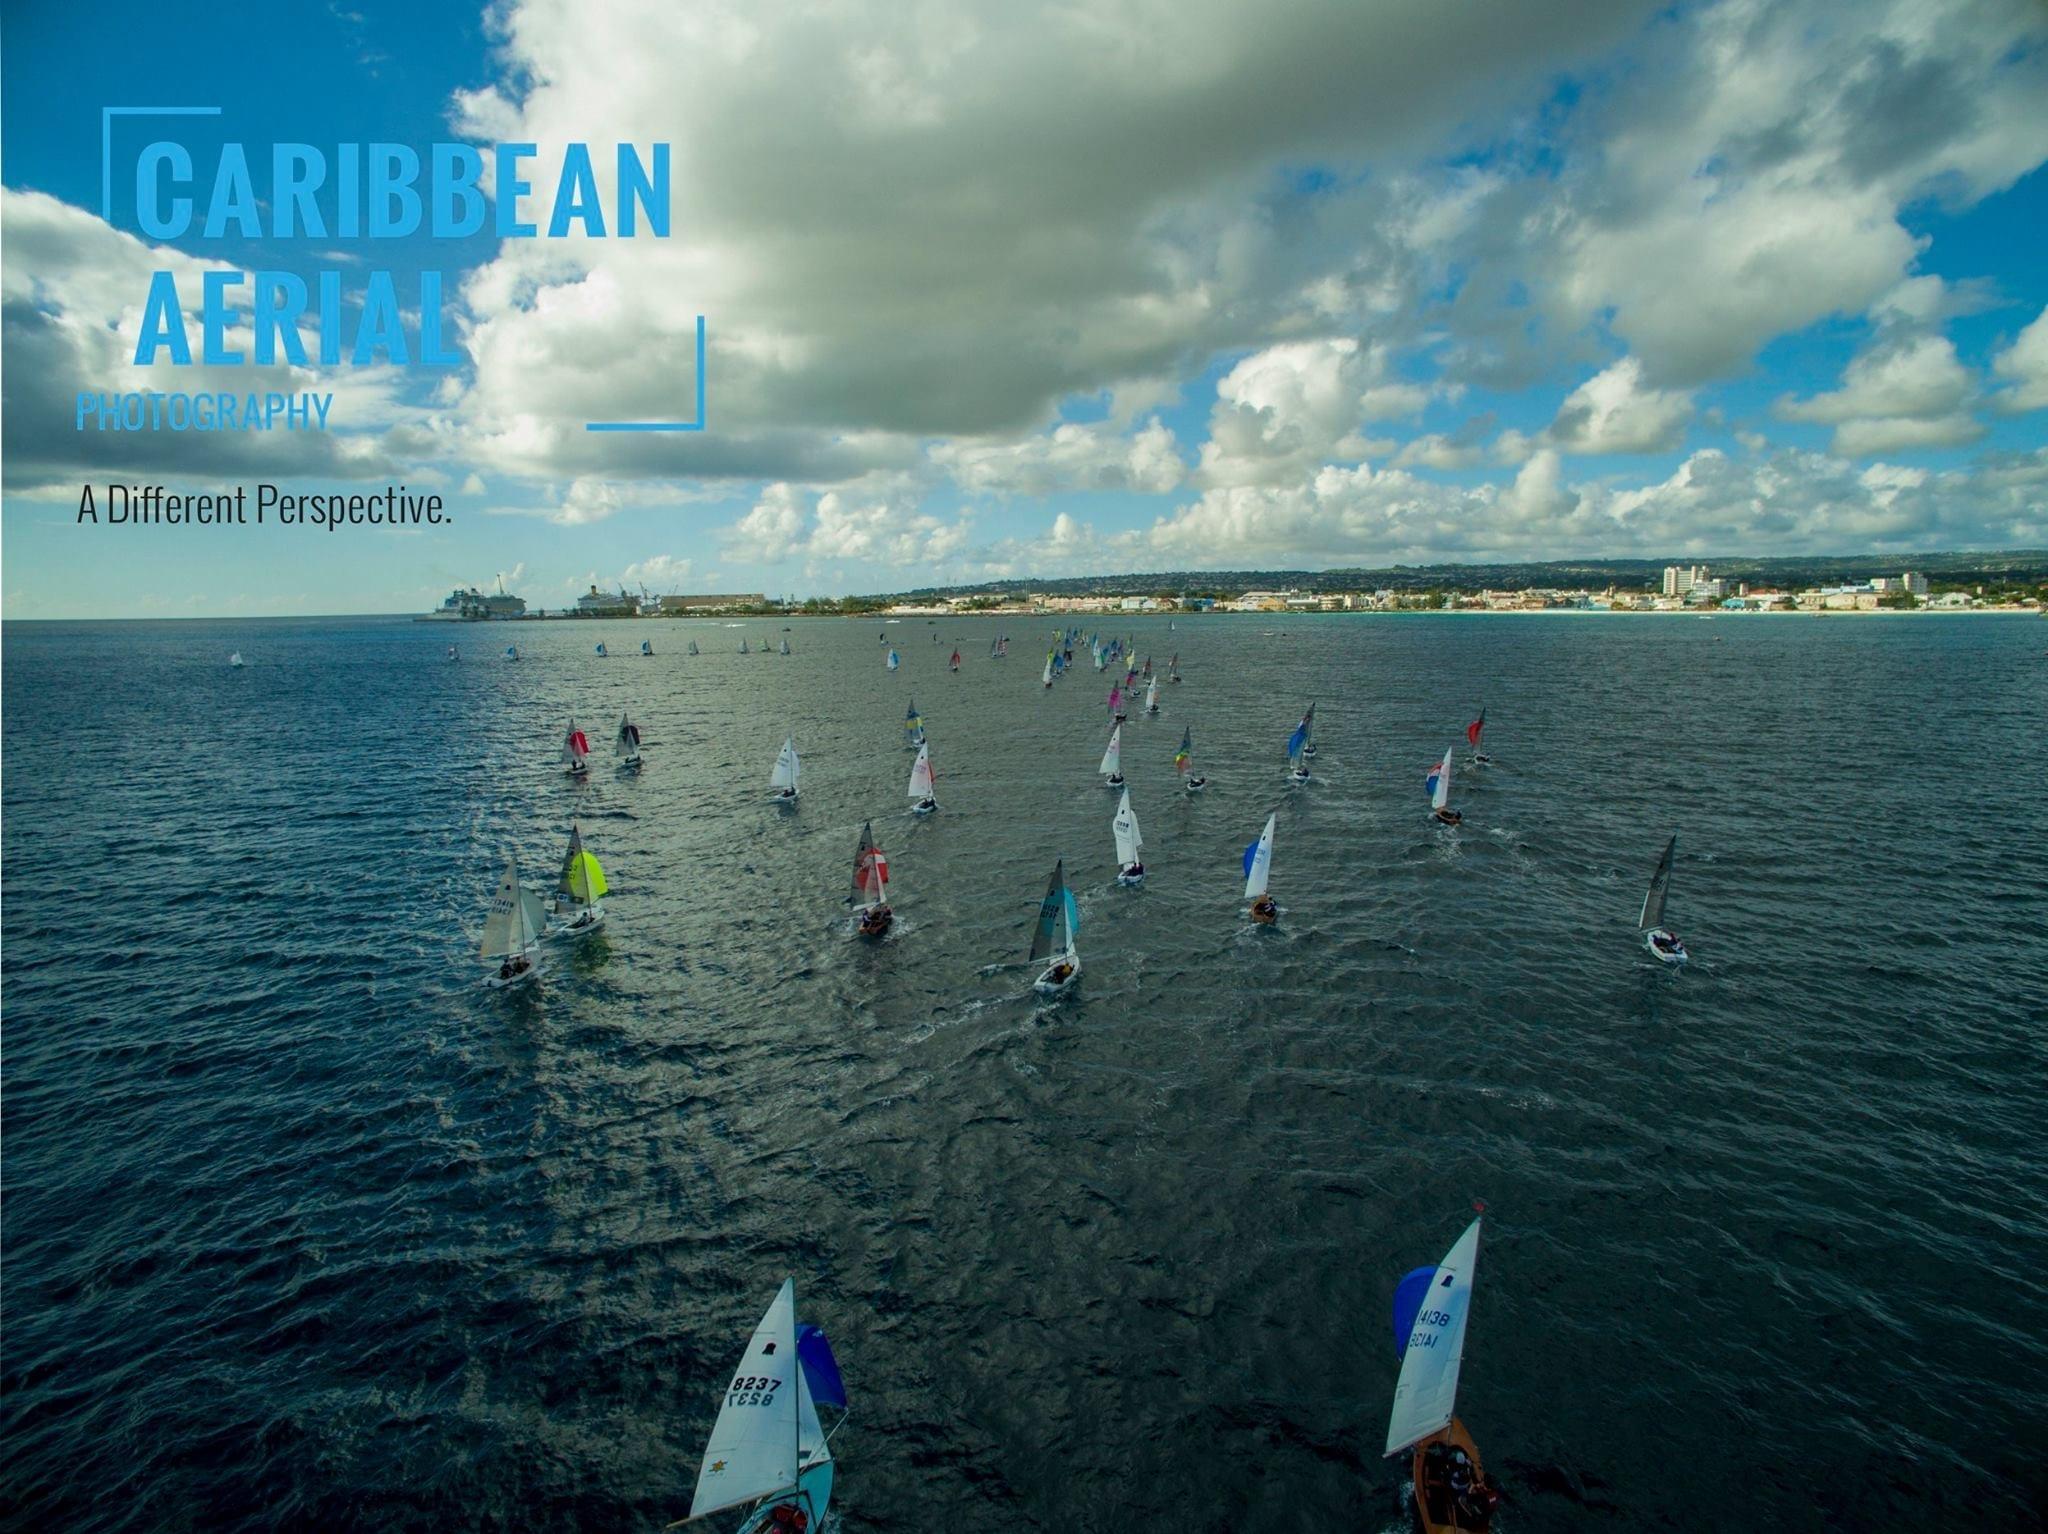 caribbean-aerial-photography-018